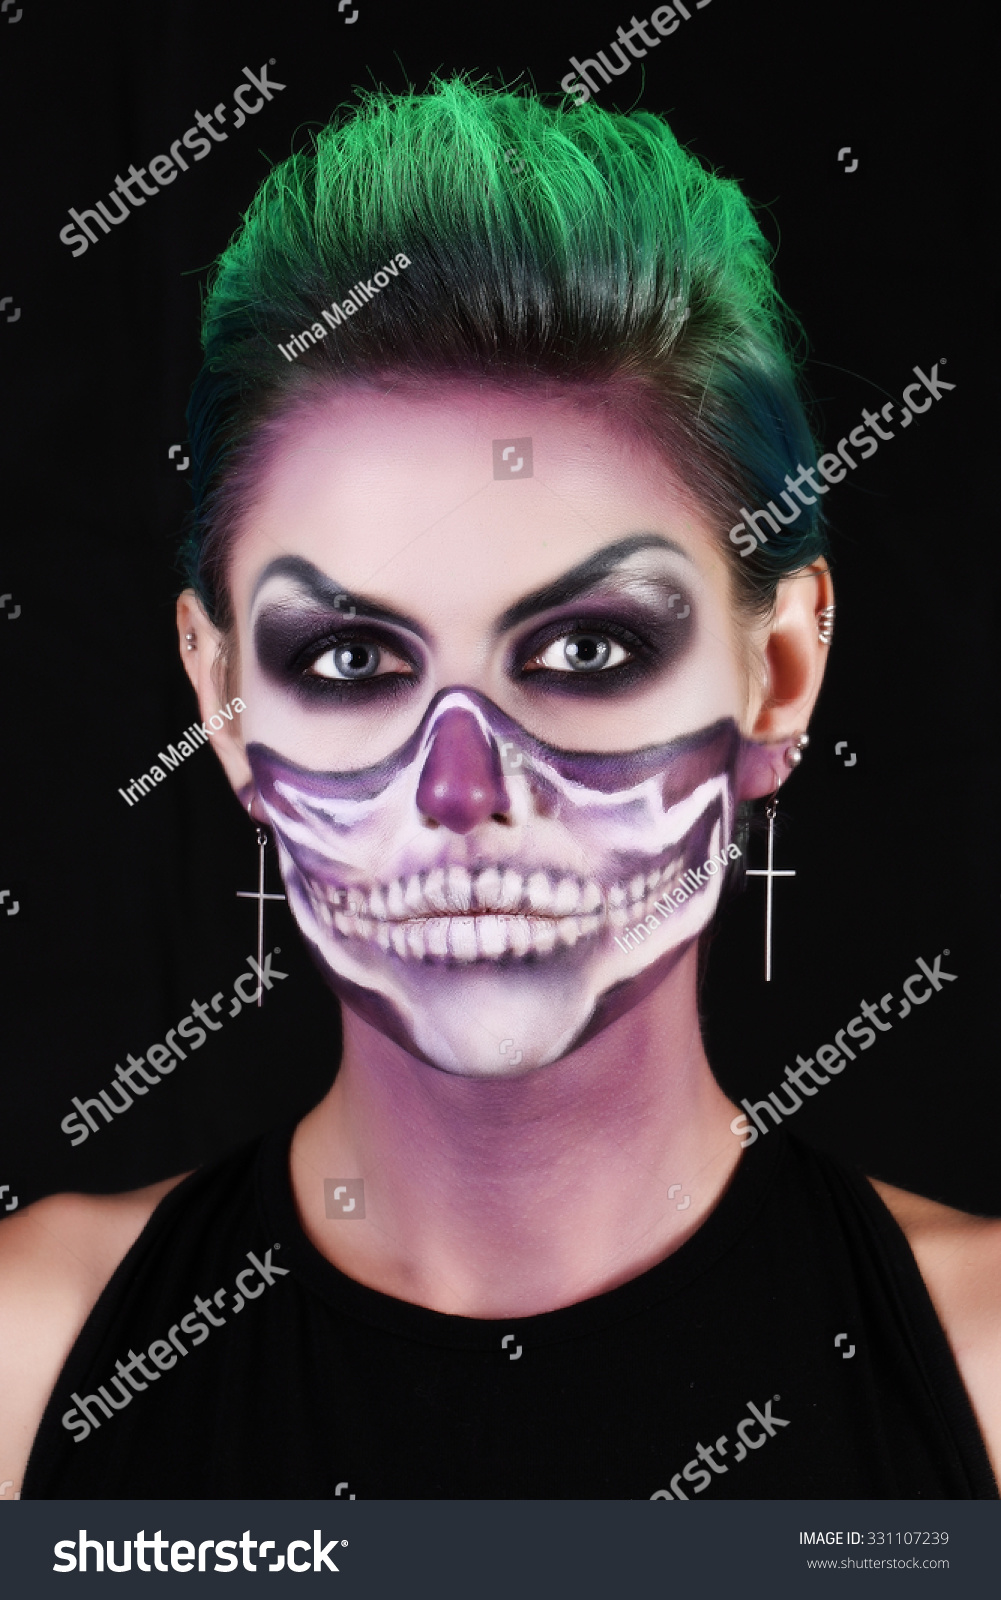 girl image zombie makeup halloween stock photo (edit now) 331107239